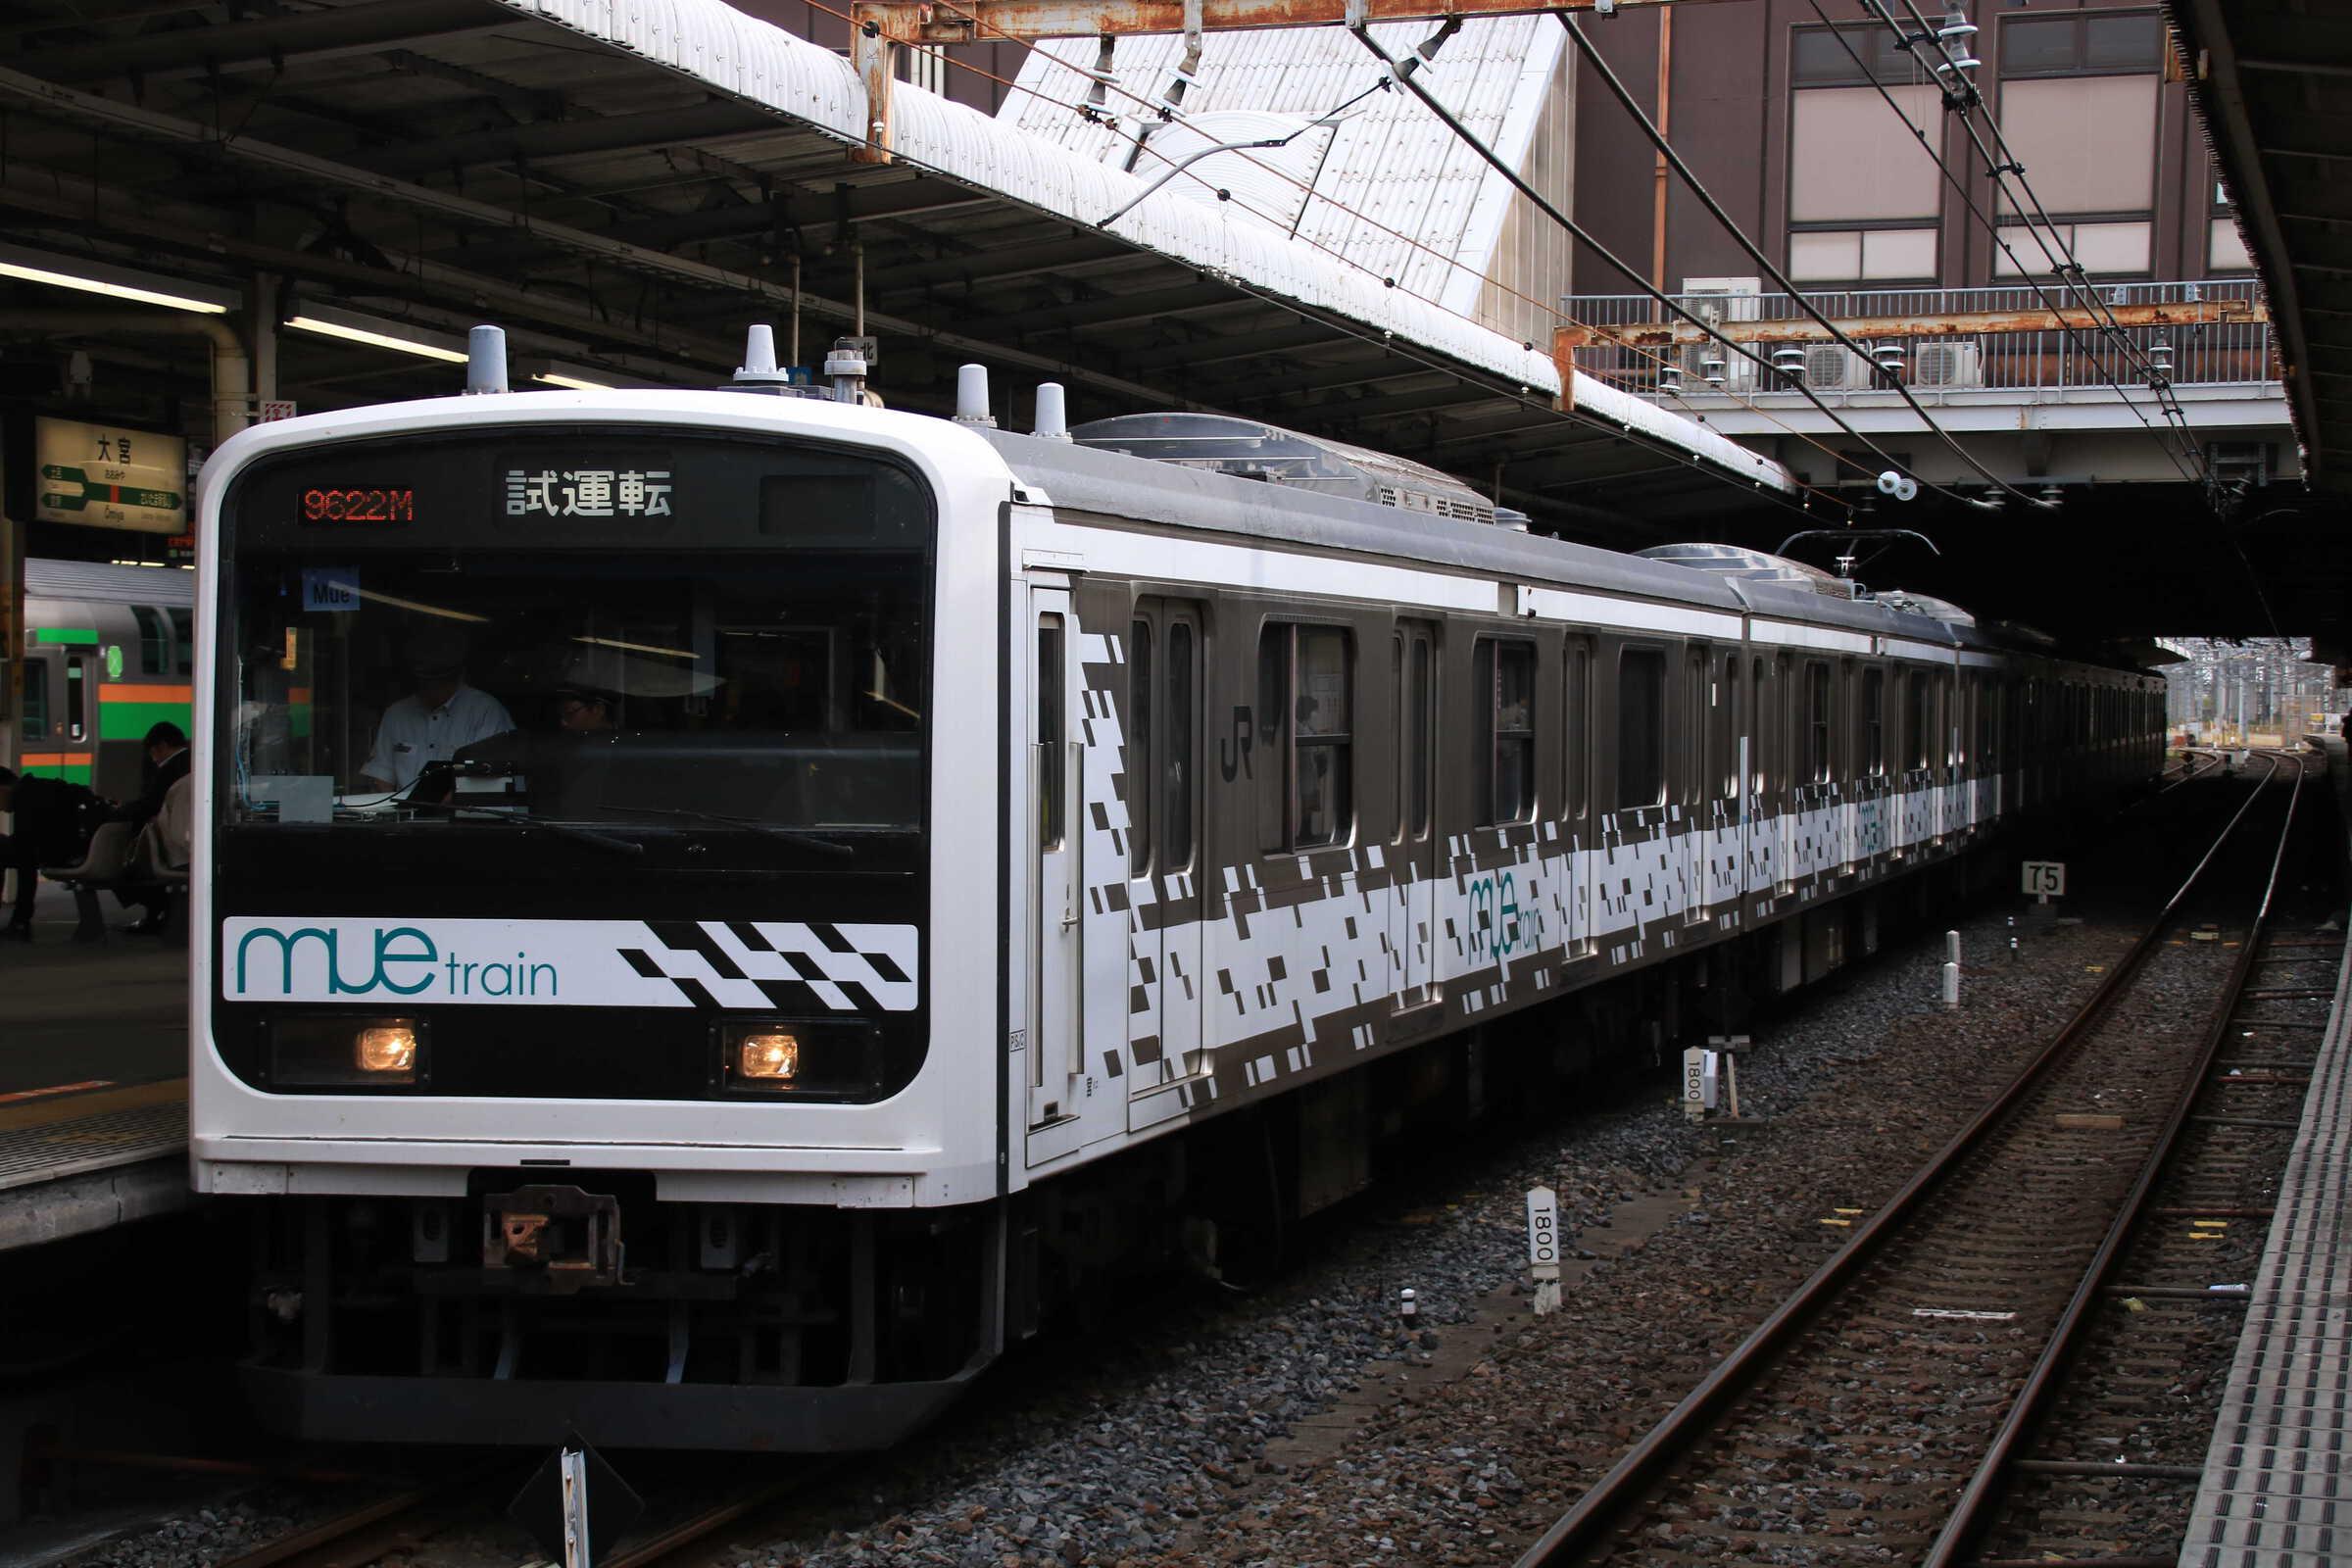 "試9622M〜試9623M 209系 ""Mue Train"" 宇都宮線試運転"